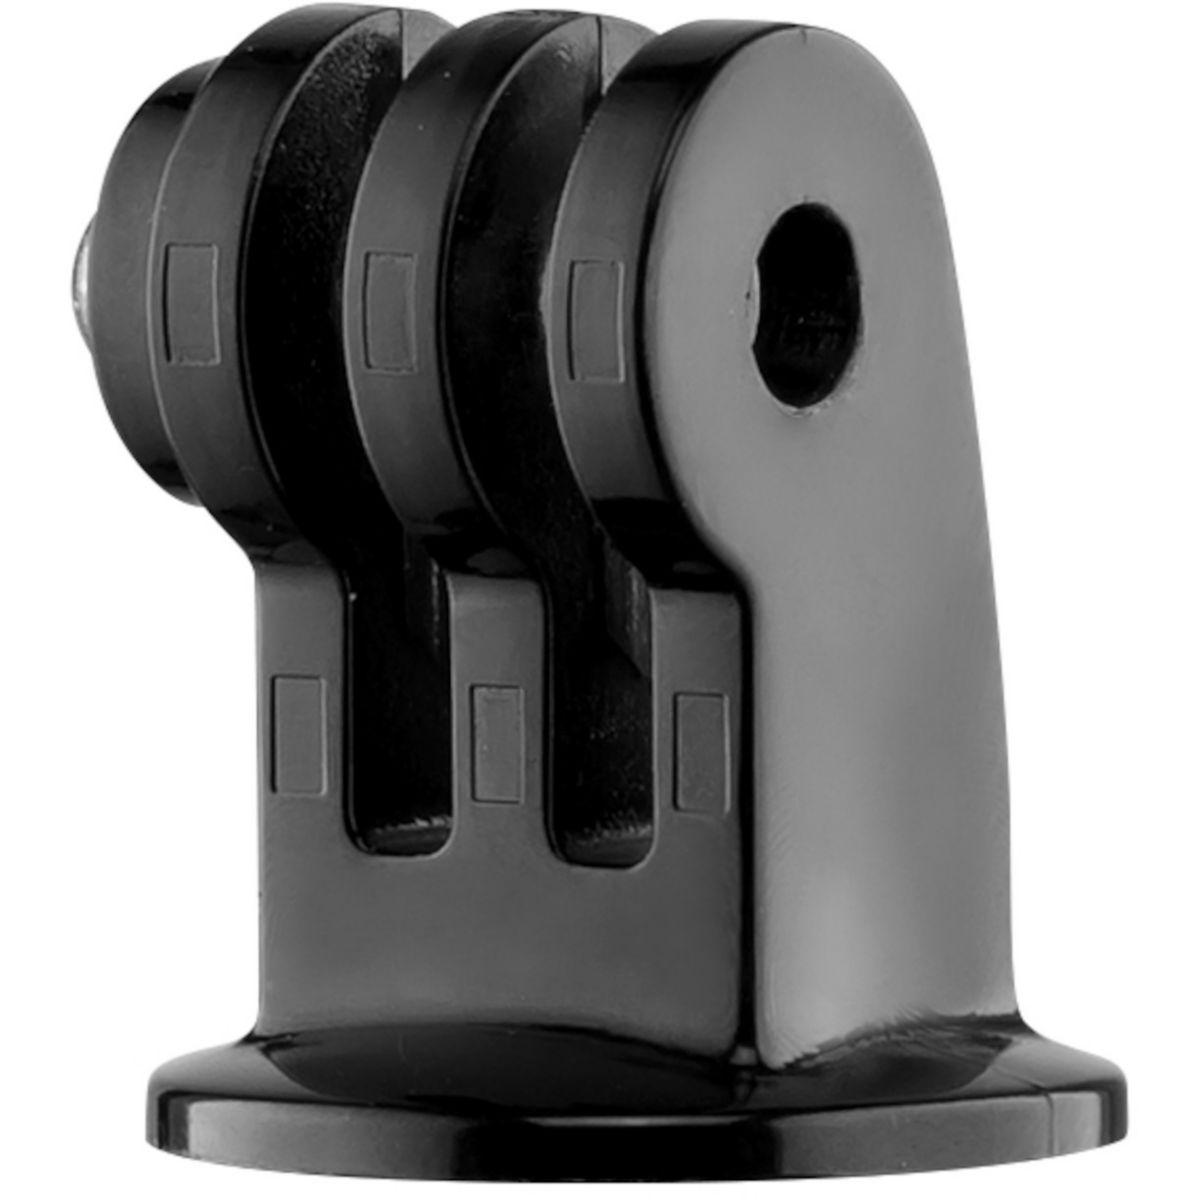 Adaptateur caméra sport MANFROTTO 1/4 de vis vers GoPro